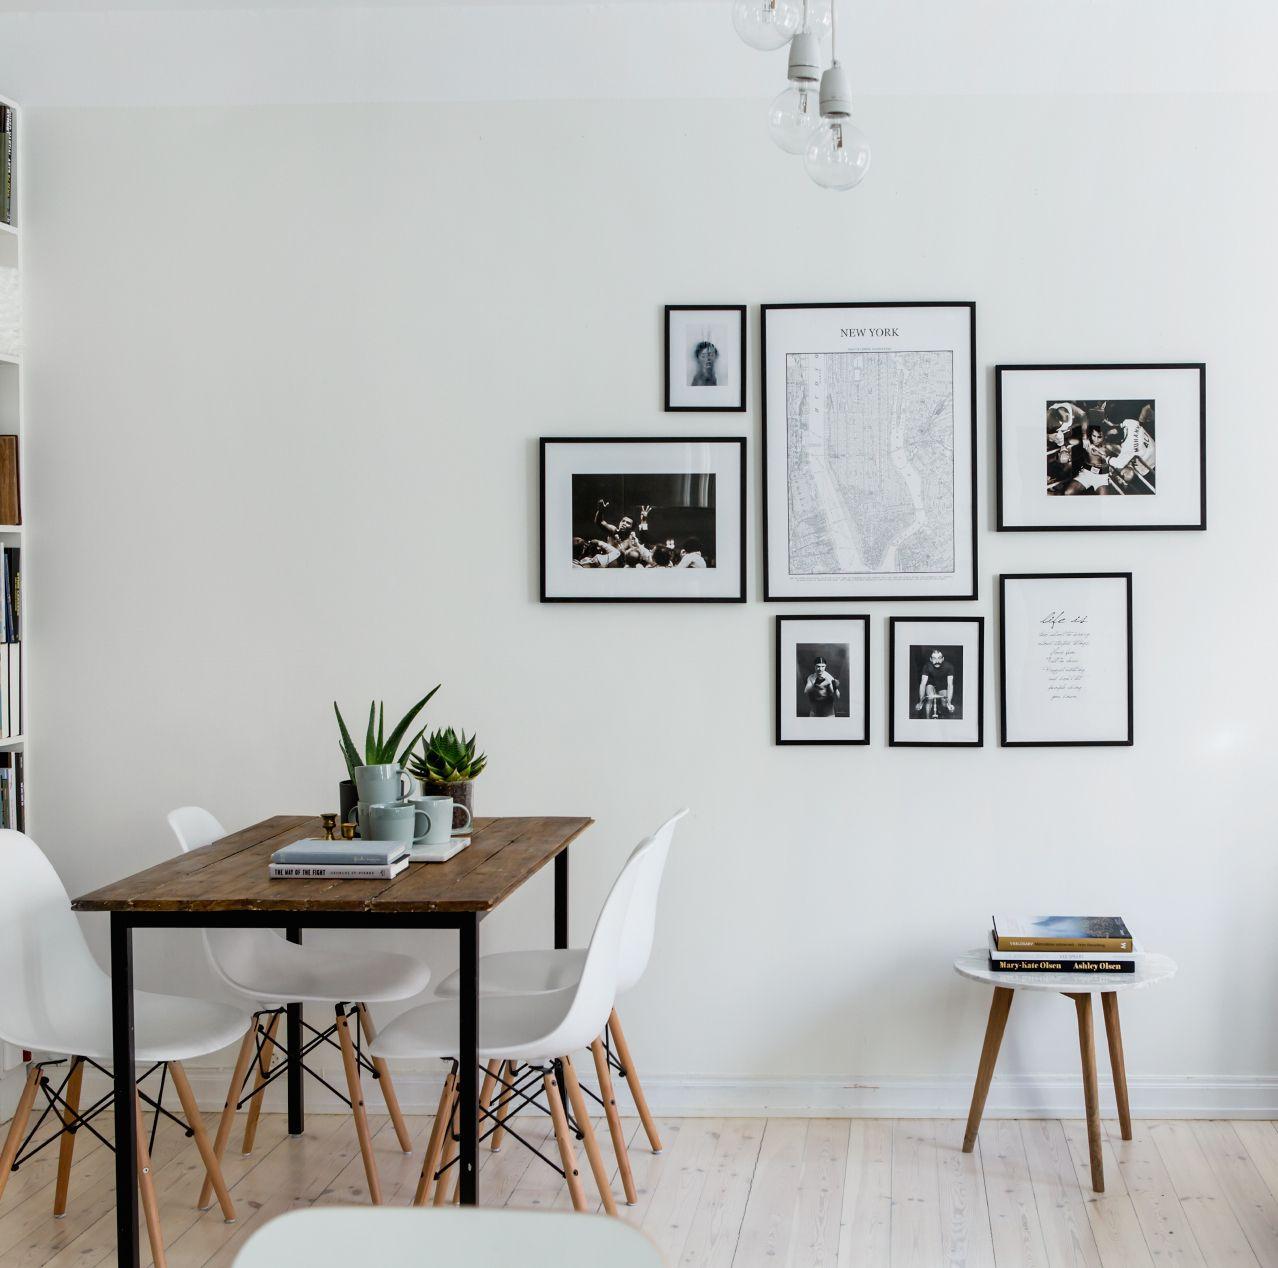 home with a grey kitchen and brass details cozy home pinterest deko wand weltraum und. Black Bedroom Furniture Sets. Home Design Ideas